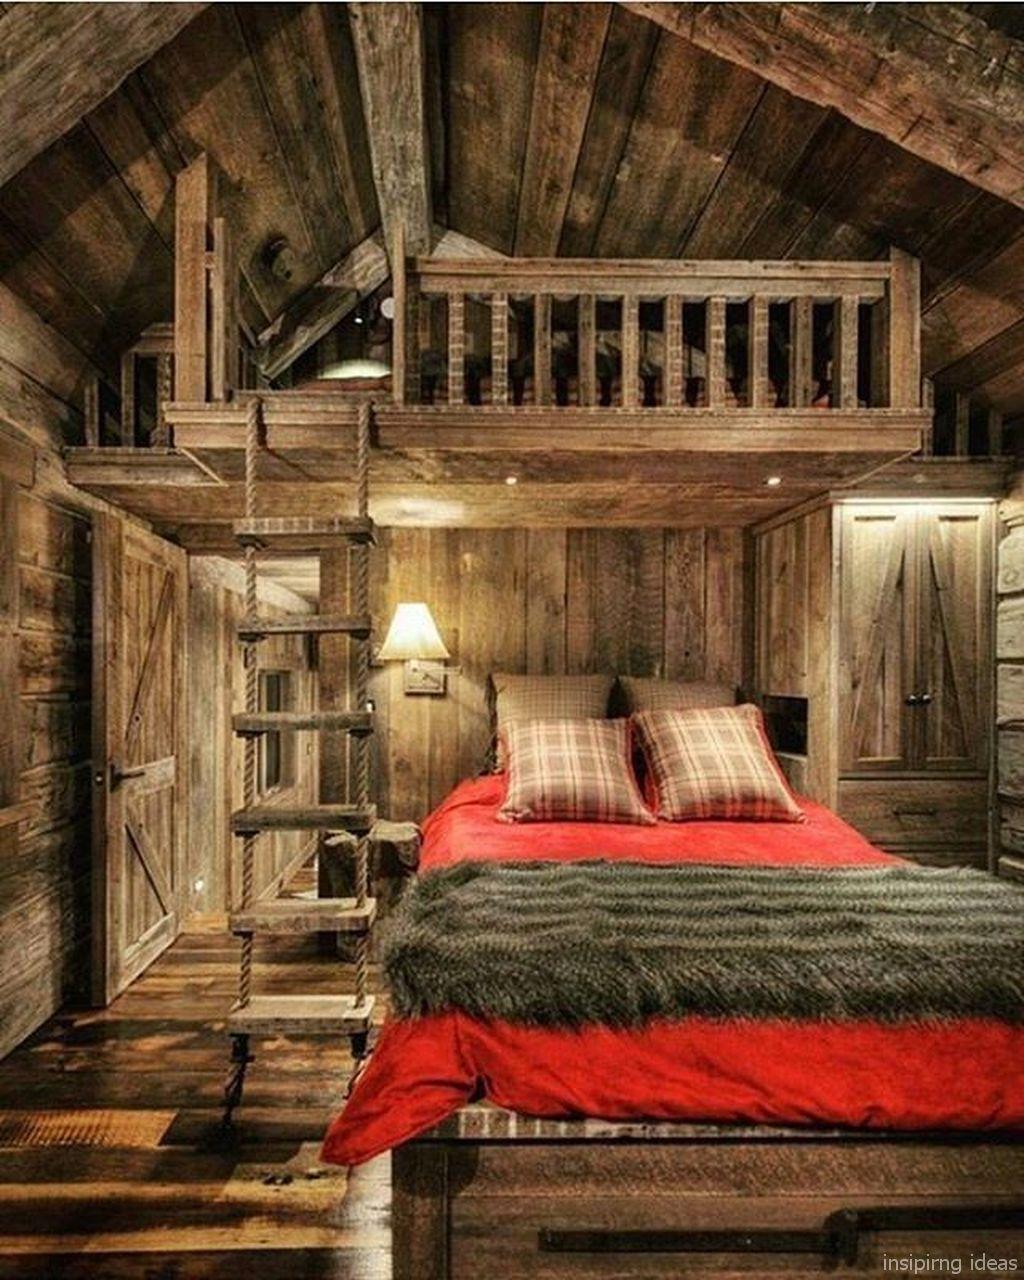 30 Rustic Chalet Interior Design Ideas: Interiores De Cabañas, Casas, Casas De Troncos